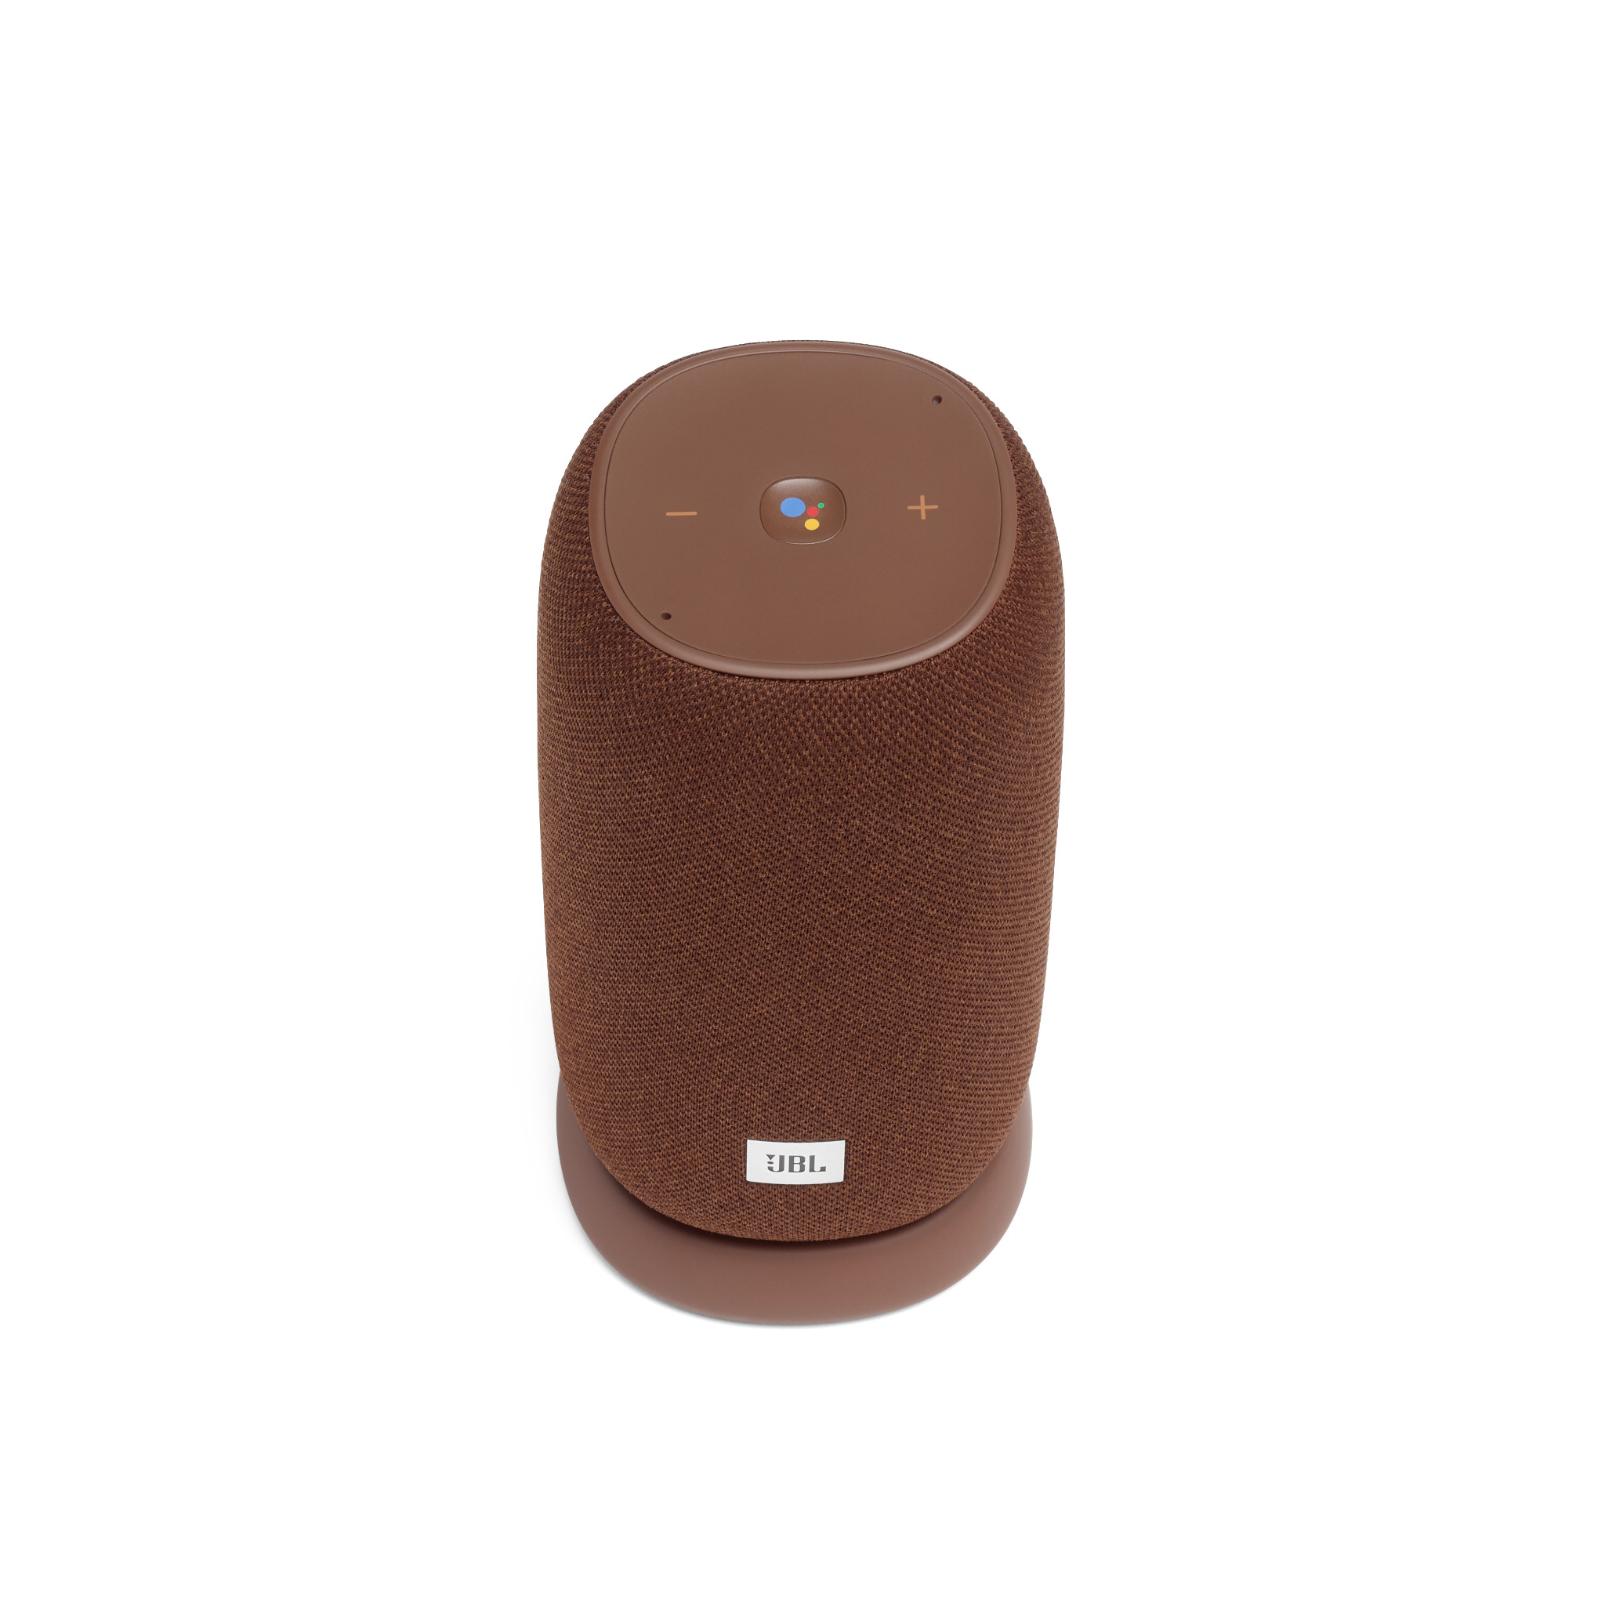 JBL Link Portable - Brown - Portable Wi-Fi Speaker - Front